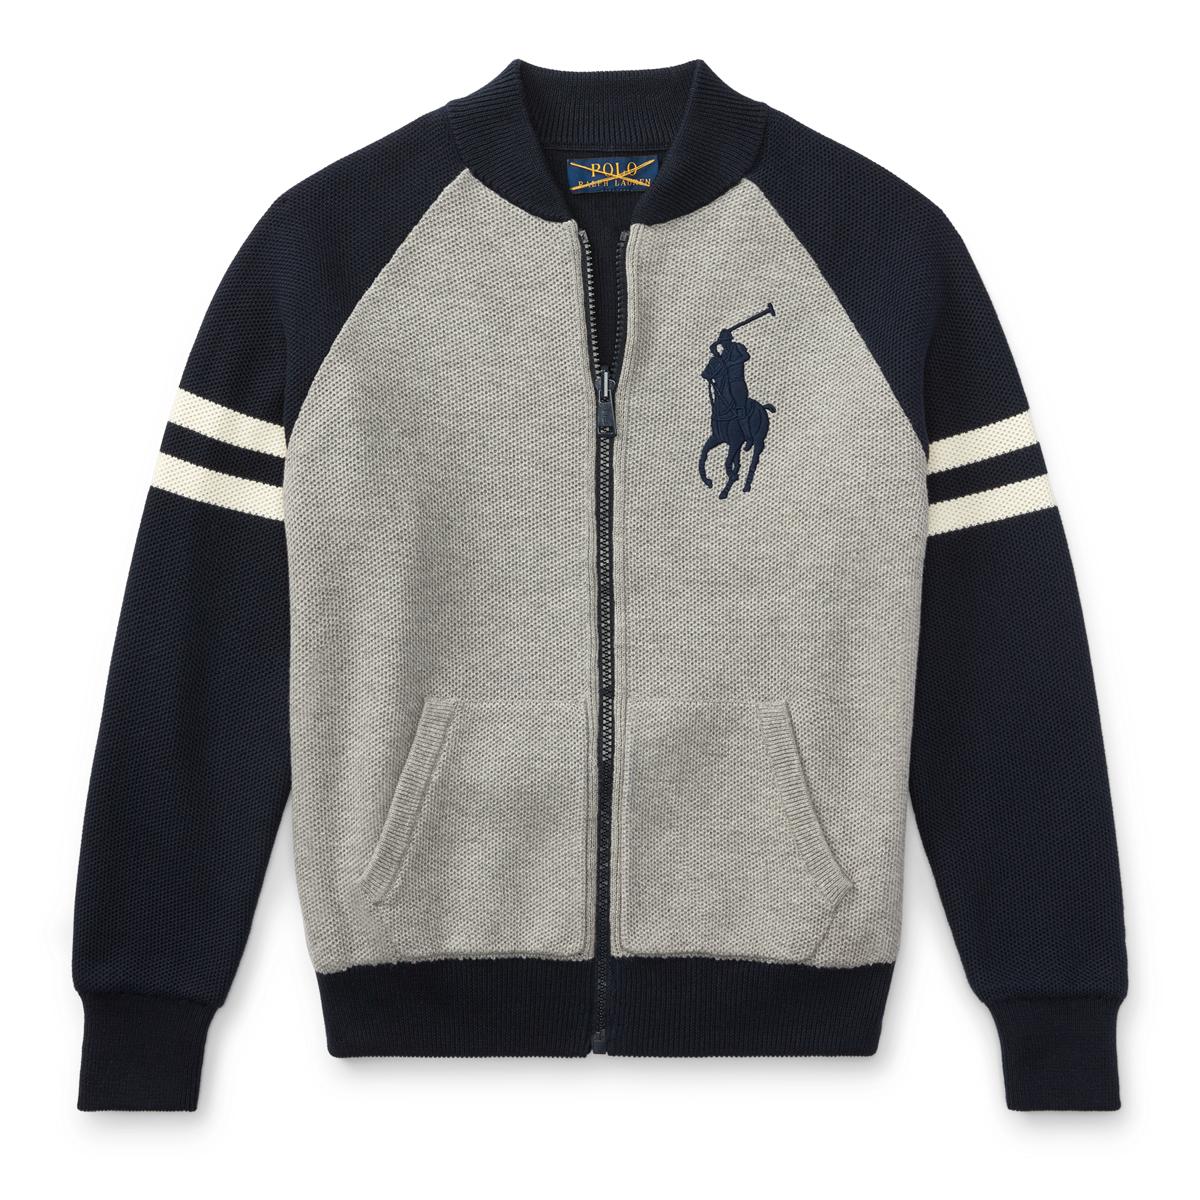 3455f4e203 Reversible Cotton Sweater | Sweaters Boys' 8-20 | Ralph Lauren